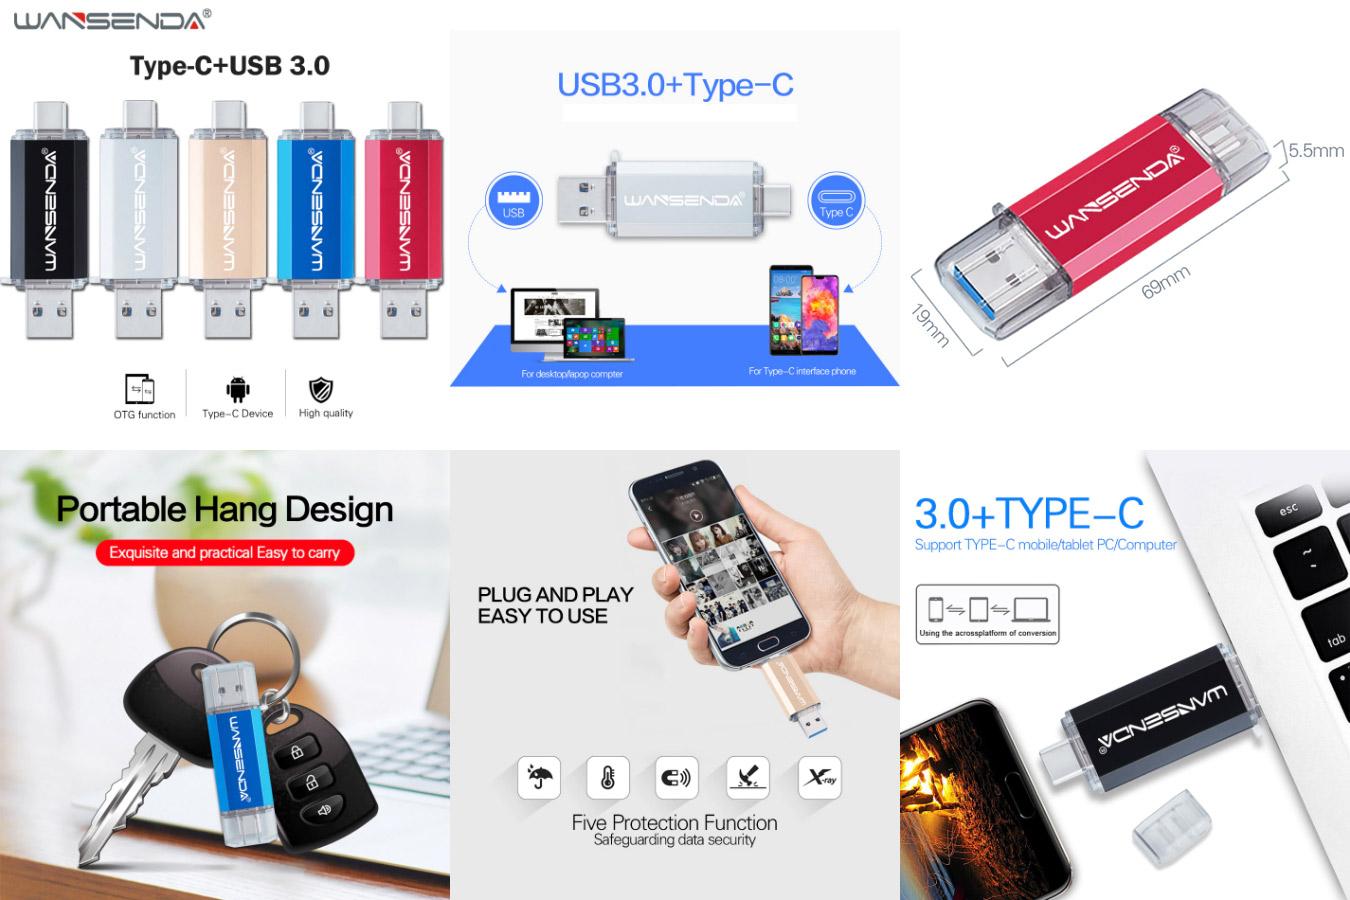 Флешка 2 в 1 для хранения данных WANSENDA OTG Flash drive